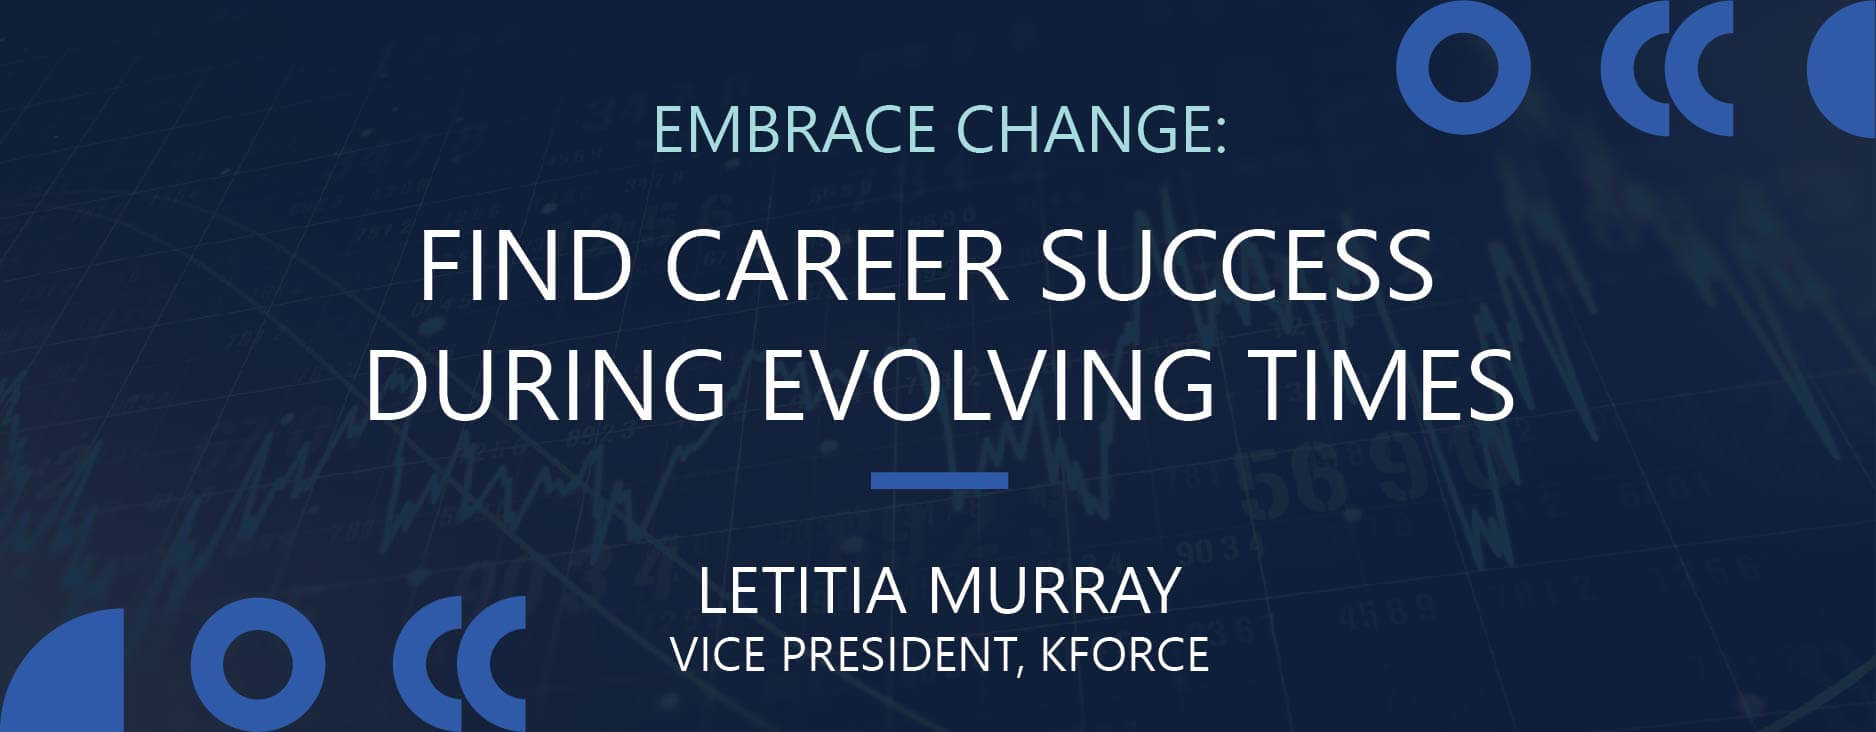 Embrace Change: Find Career Success During Evolving Times